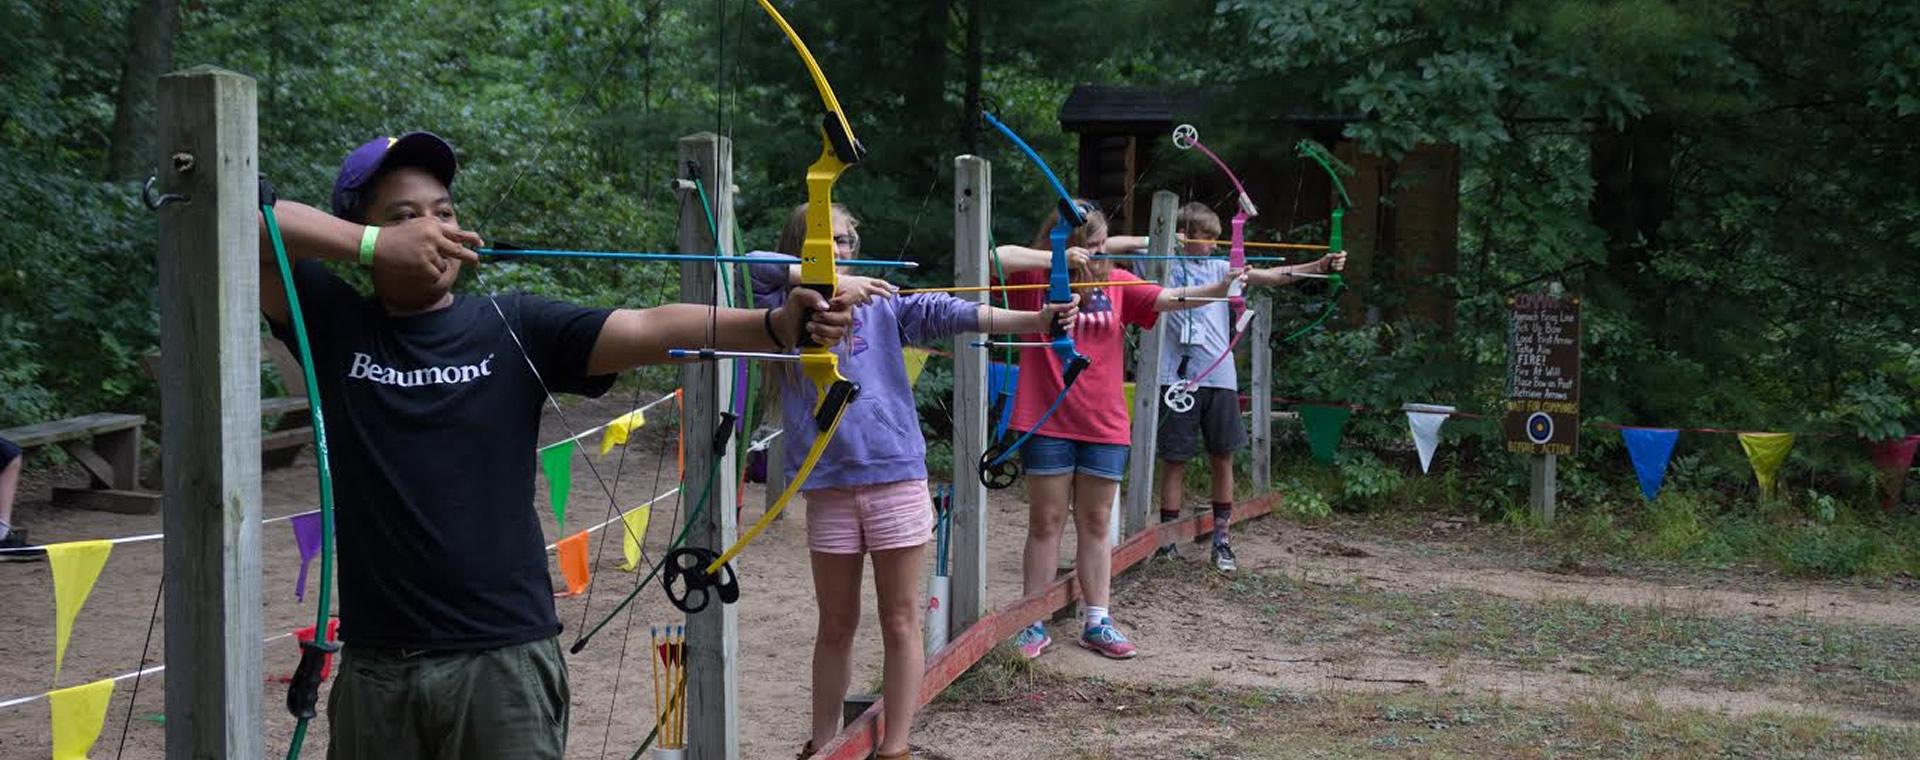 Kids at archery practice